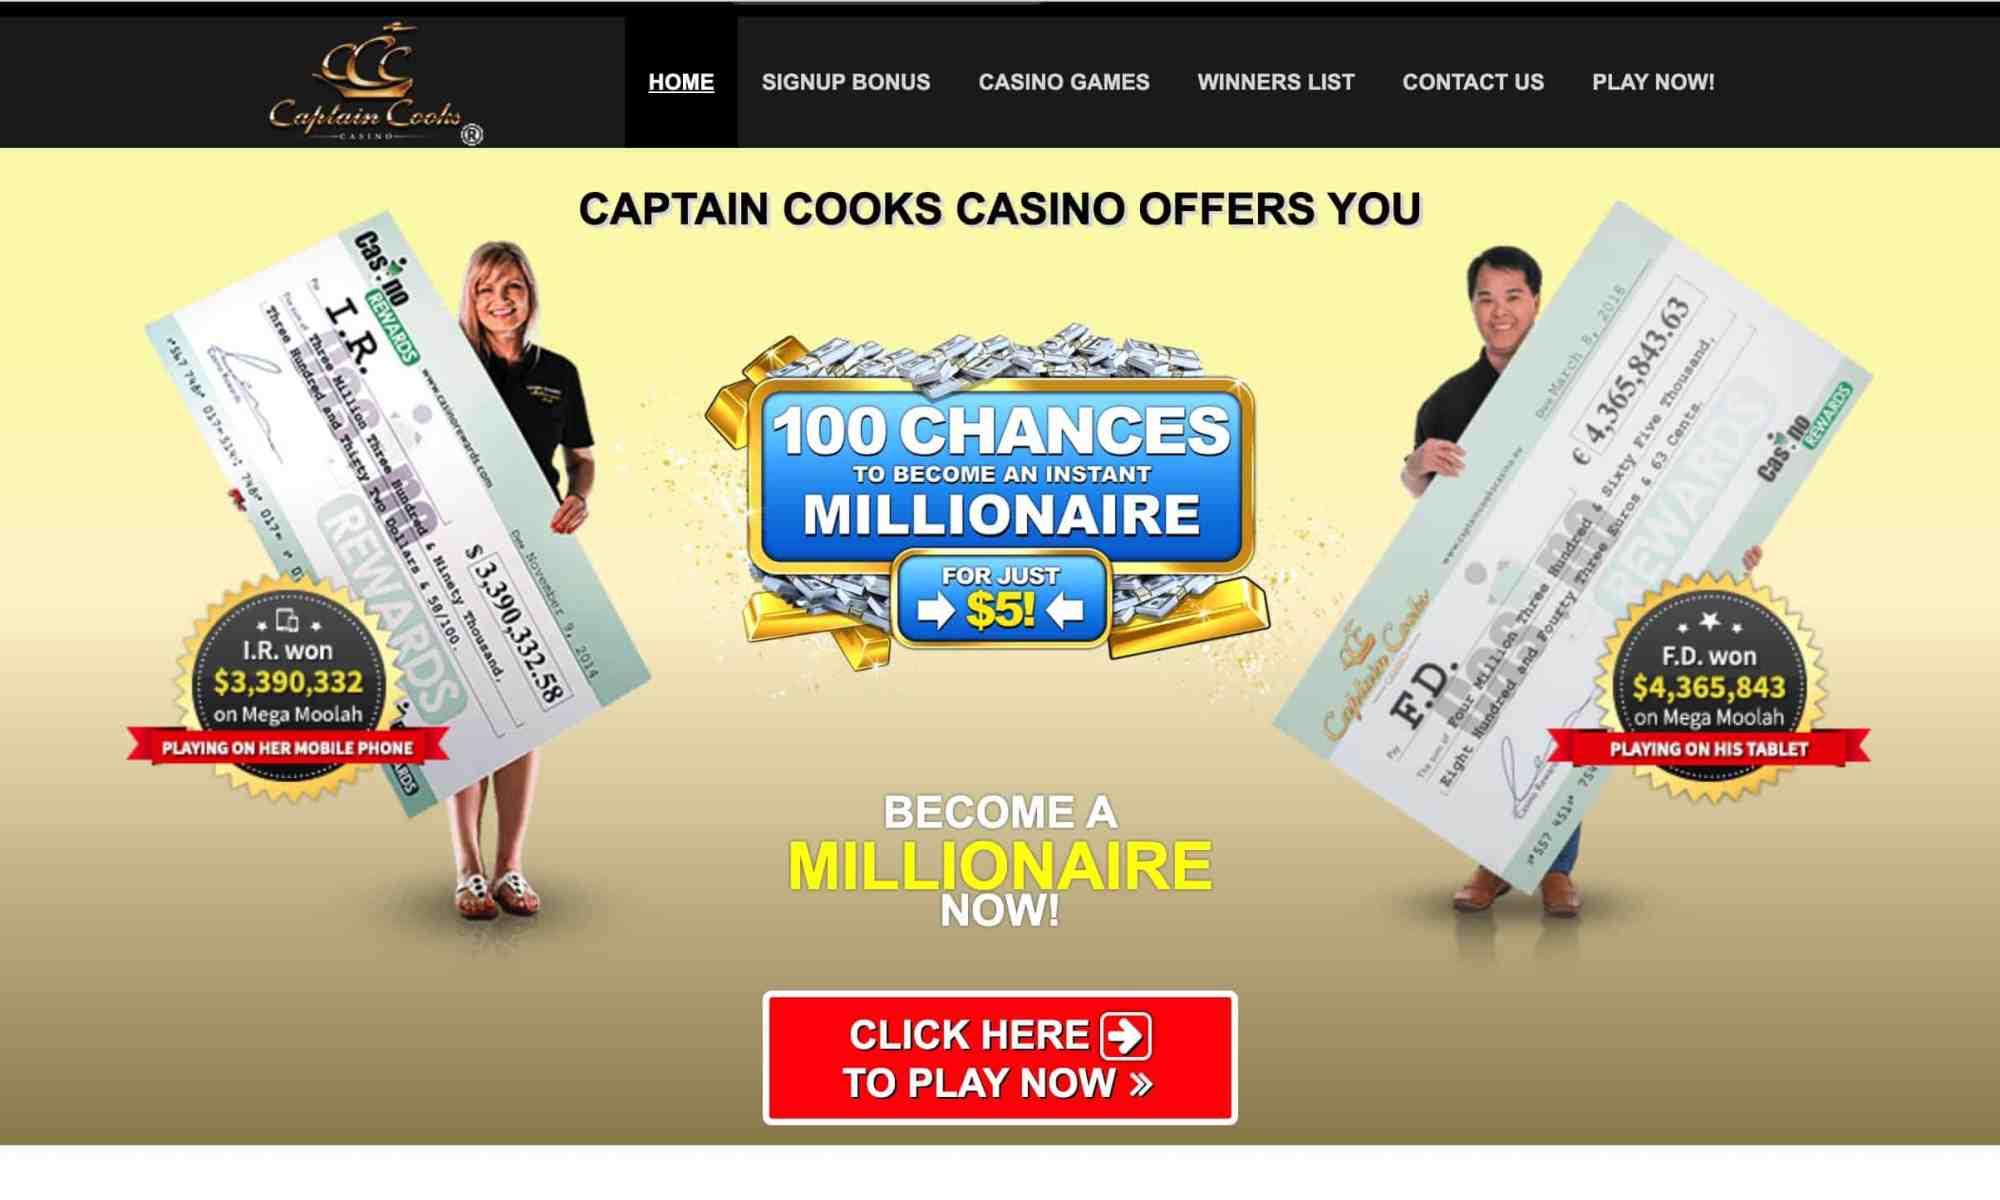 Captain Cooks Casino: mega moolah + 100 chances to win big